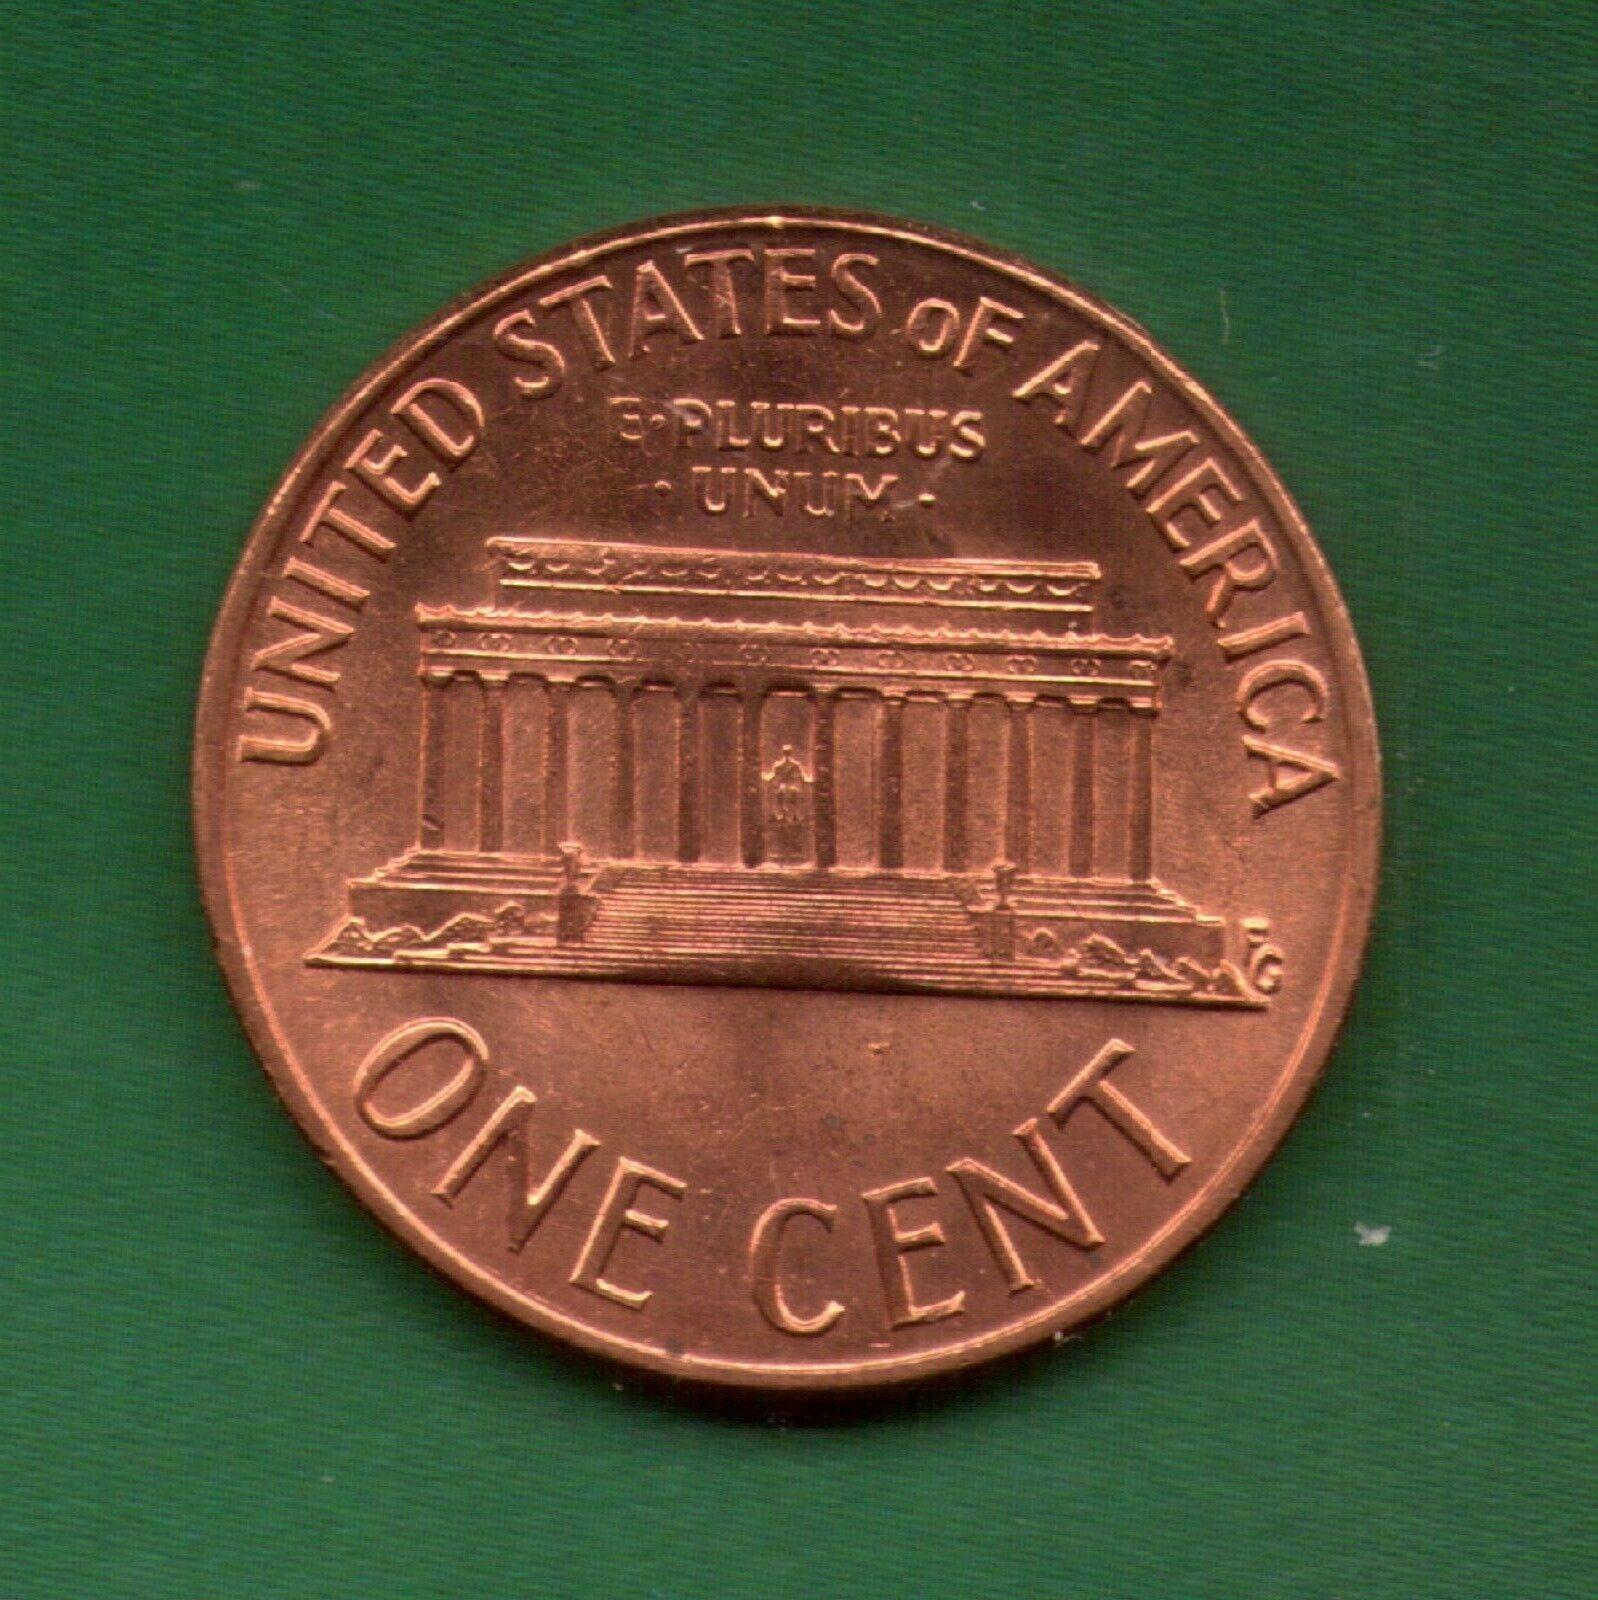 1973 S Penny UNC Slot Filler or Starter Coin   (73S0712) - Image 2